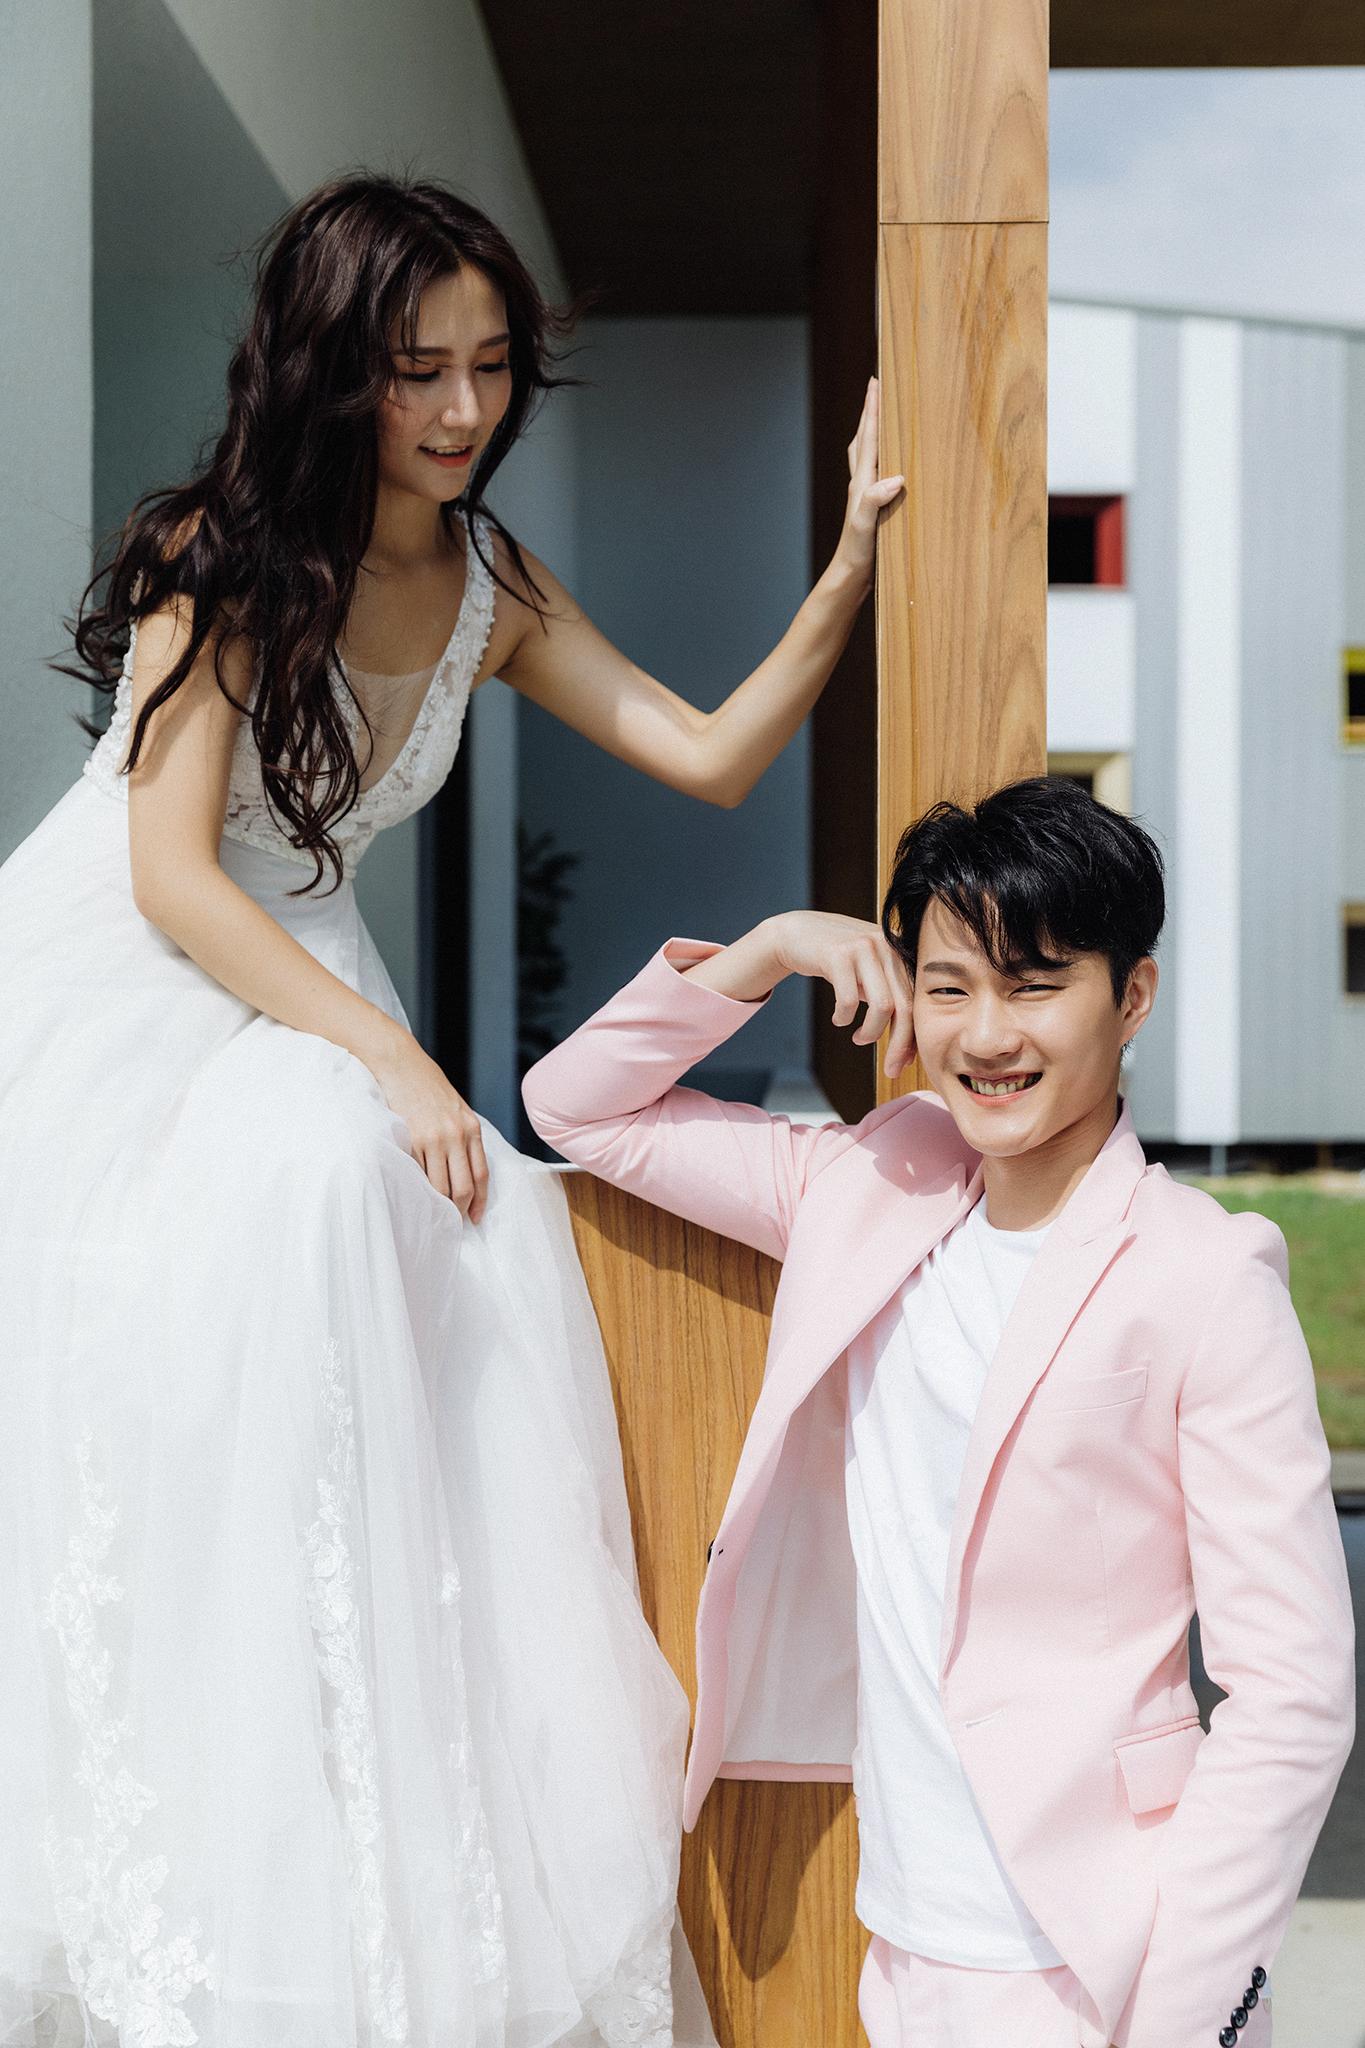 48592346902 2a1573653d o - 【自主婚紗】+Ying&Wiwi+